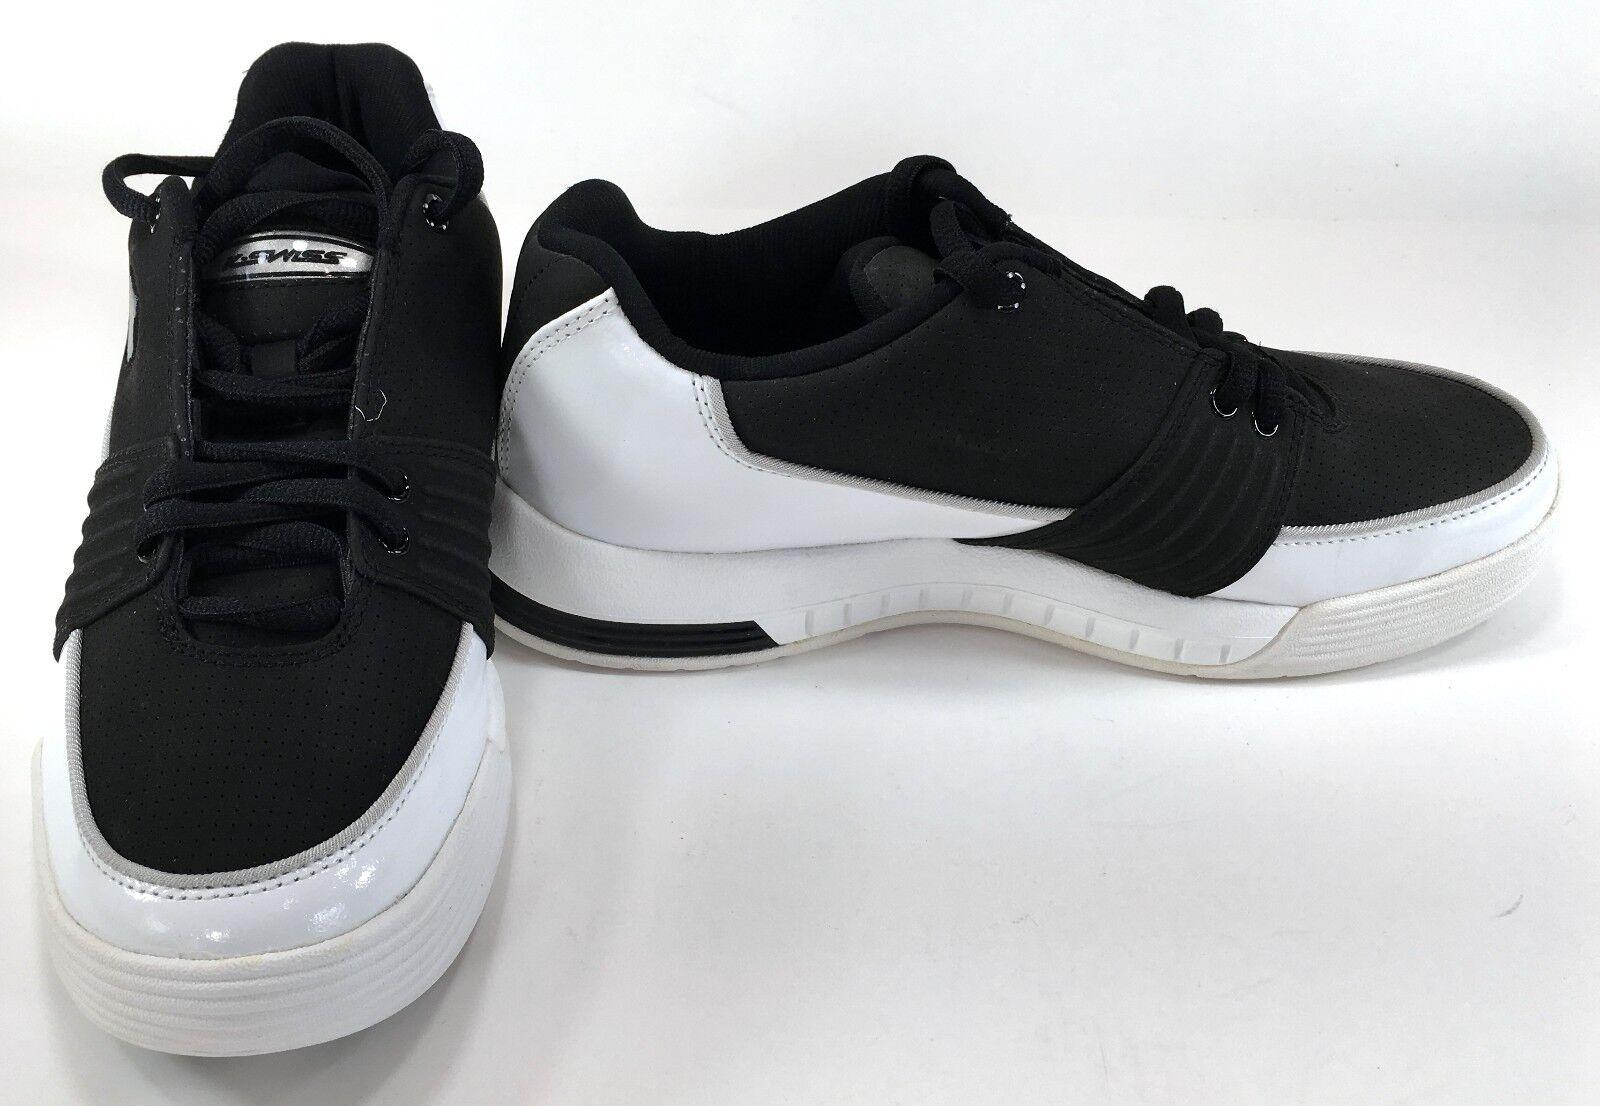 K-Swiss shoes Elwyn Leather Suede White Black Sneakers Size Mens 8 Womens 10